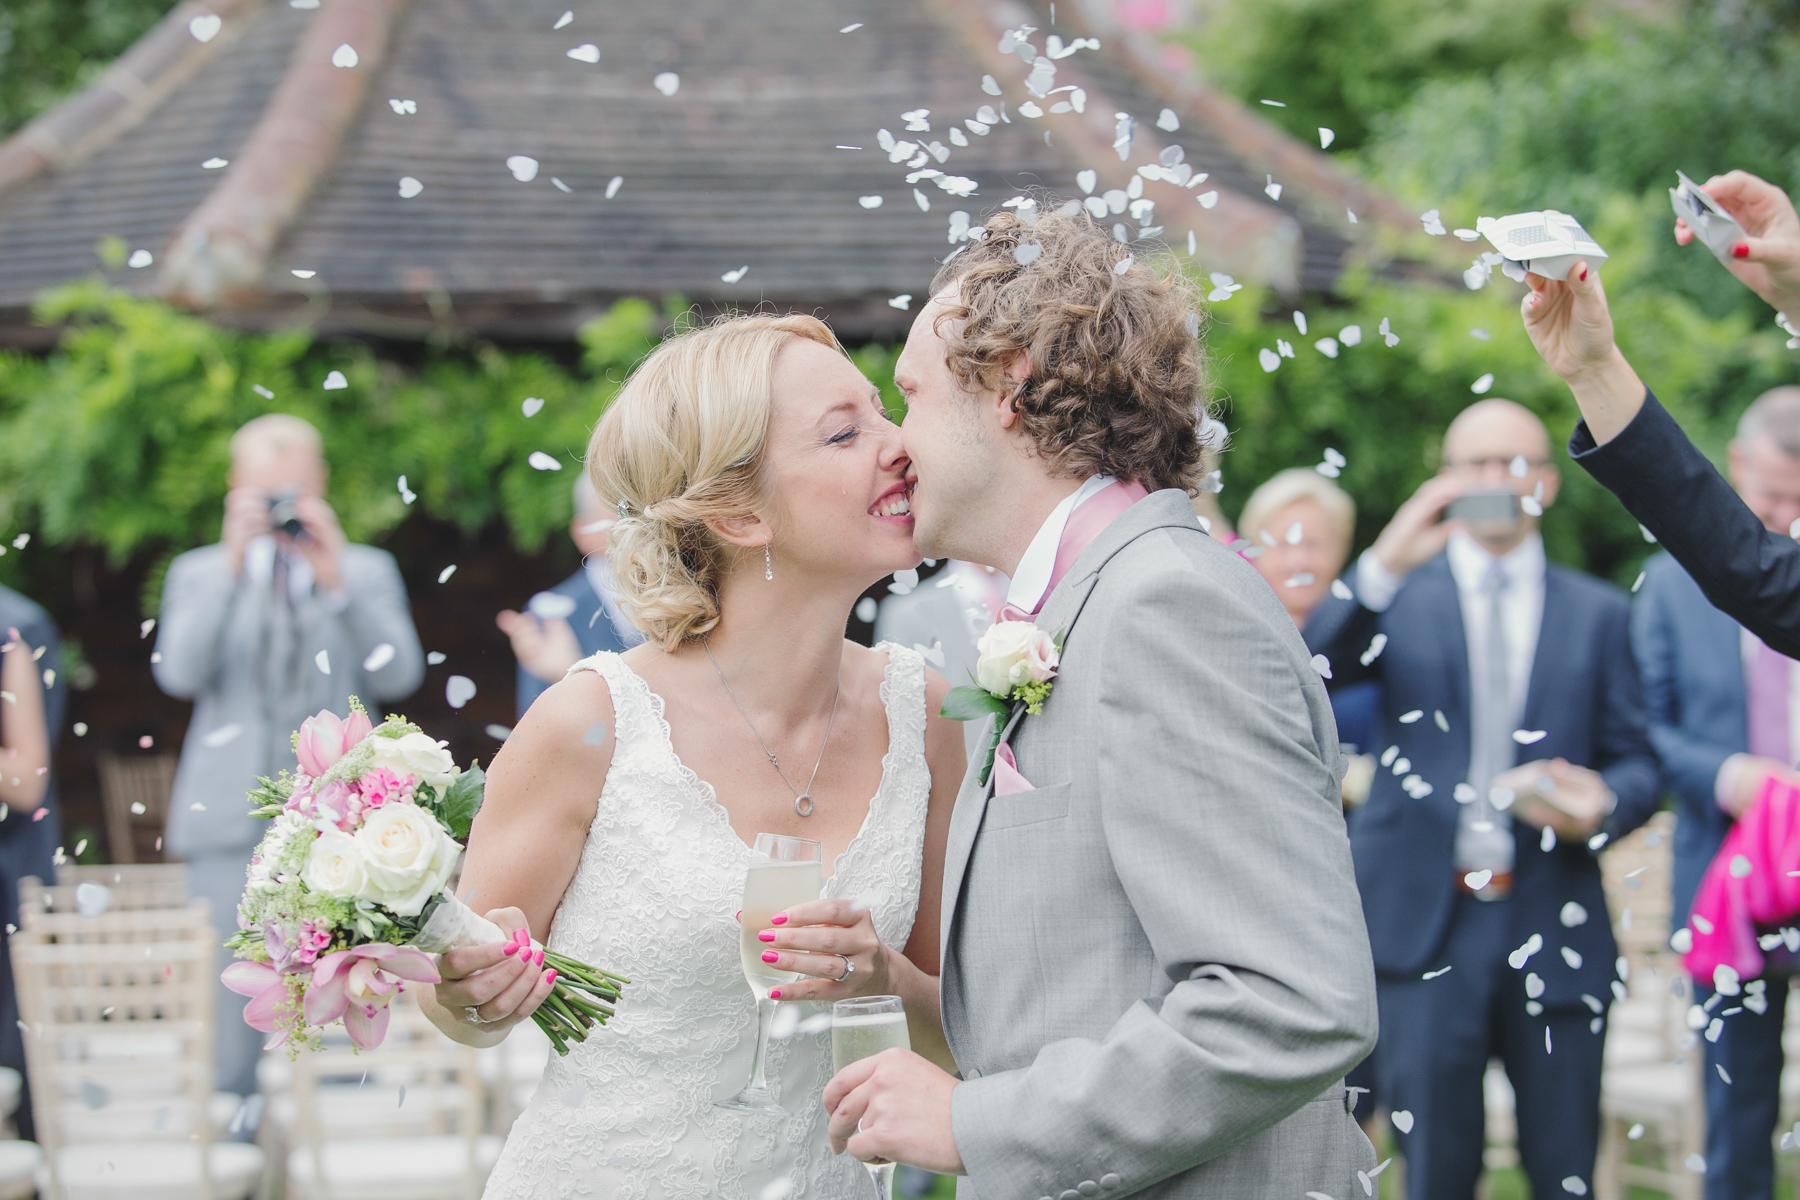 Wedding celebration  with confetti